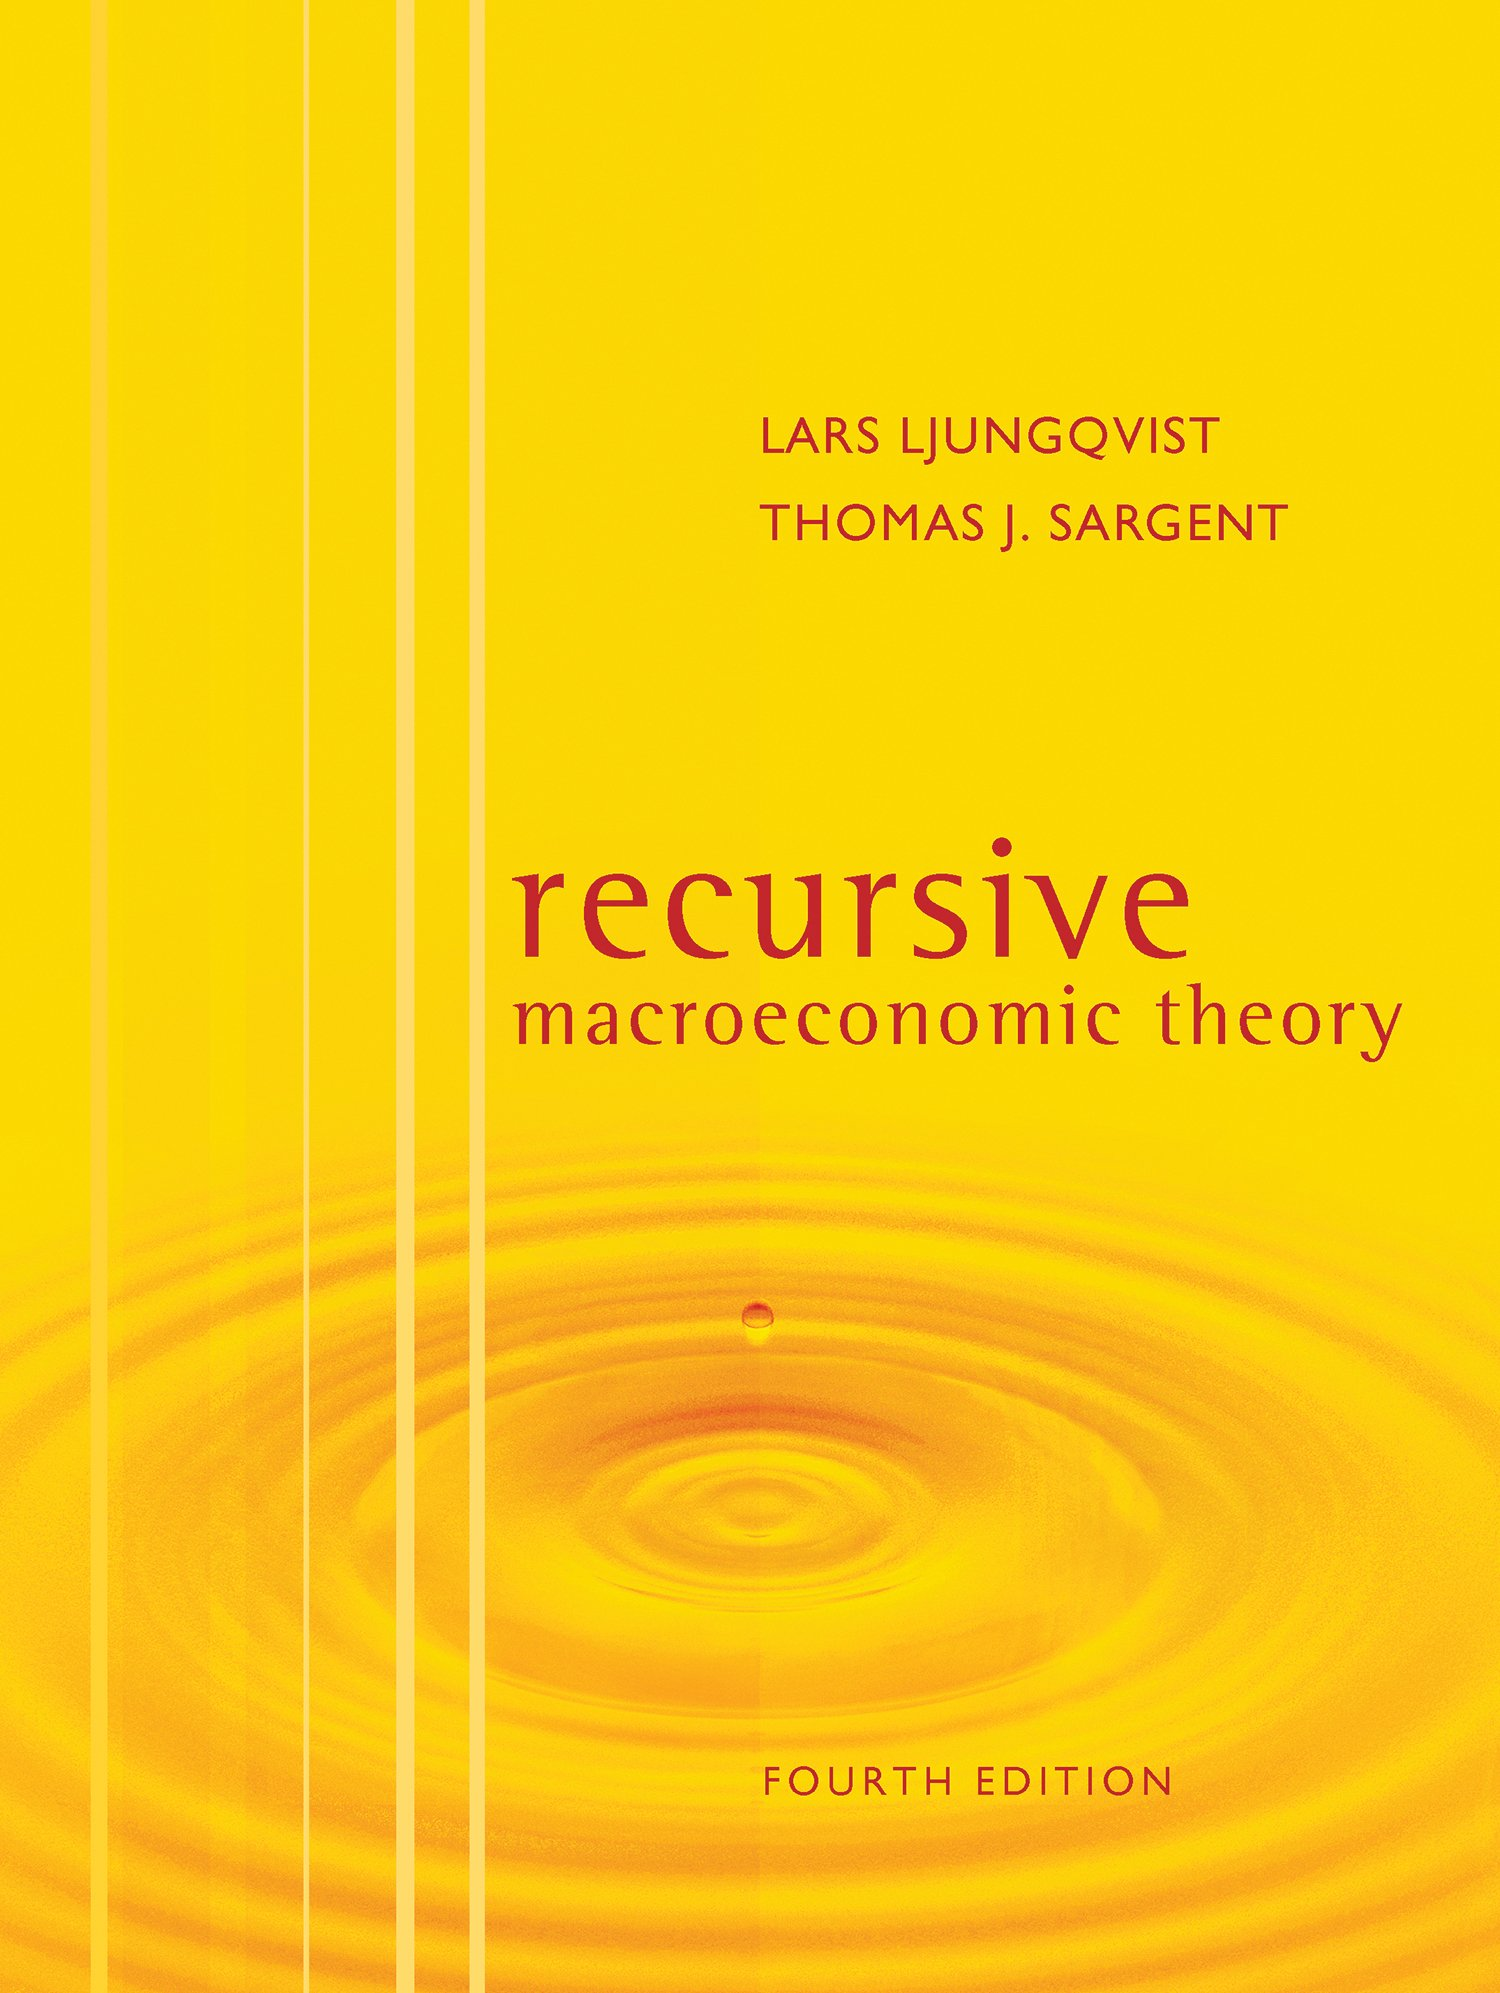 Recursive Macroeconomic Theory (The MIT Press) by The MIT Press